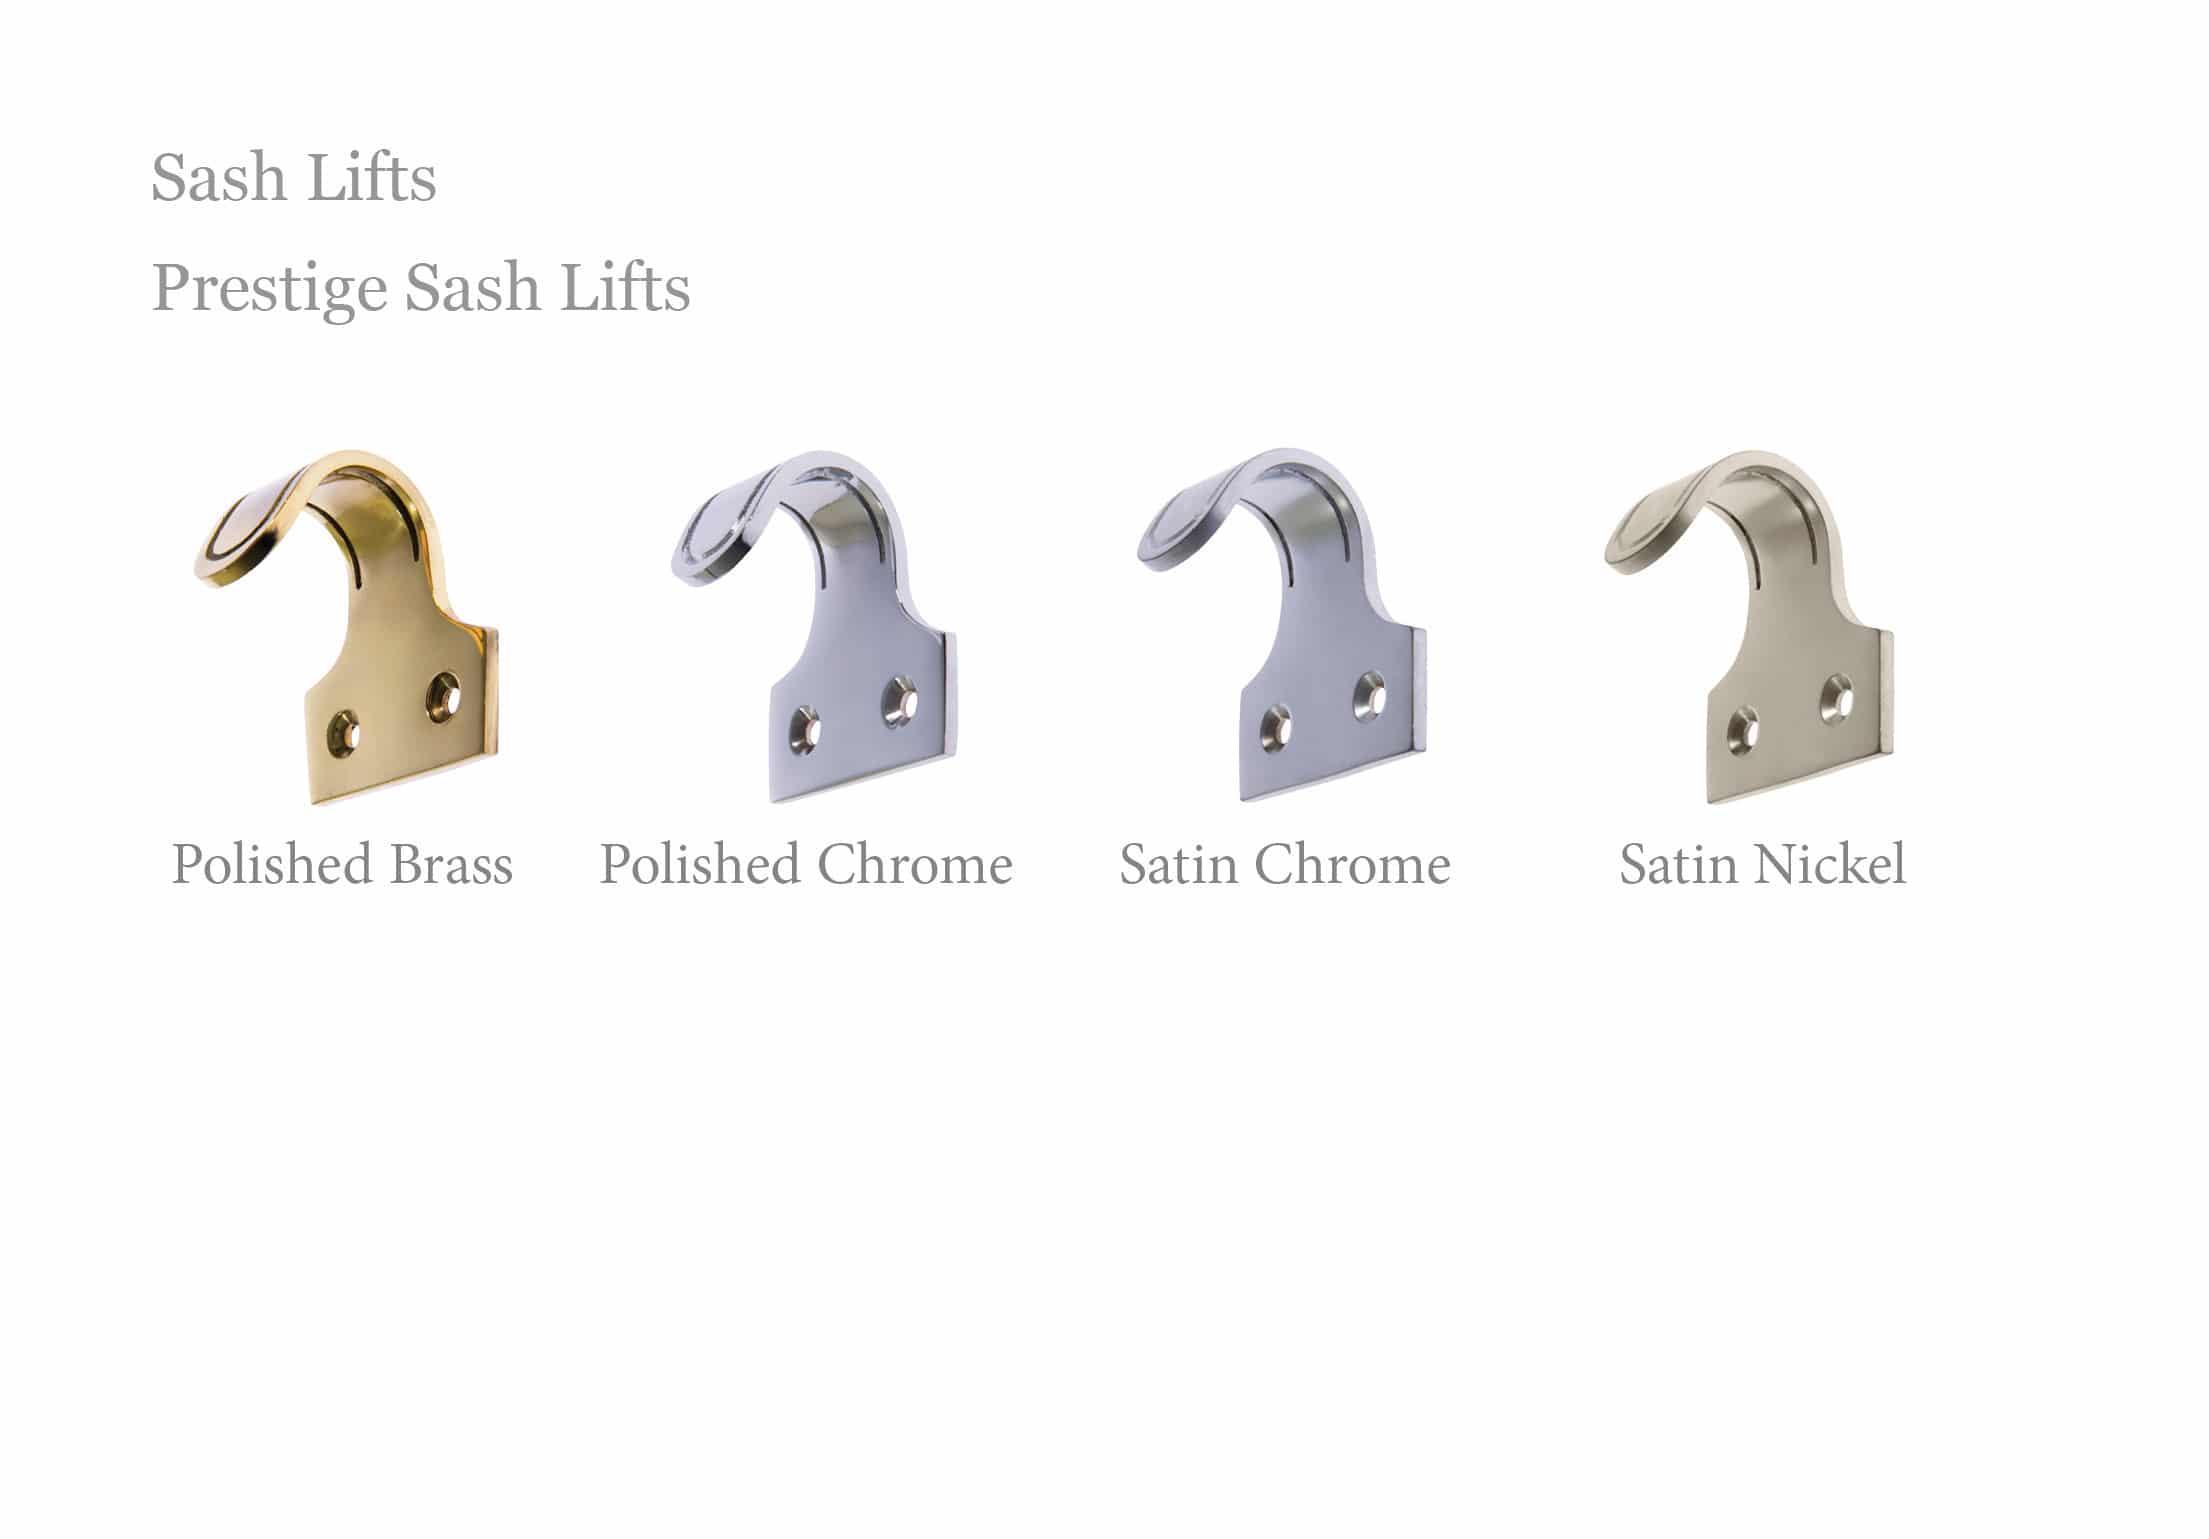 Prestige sash lifts